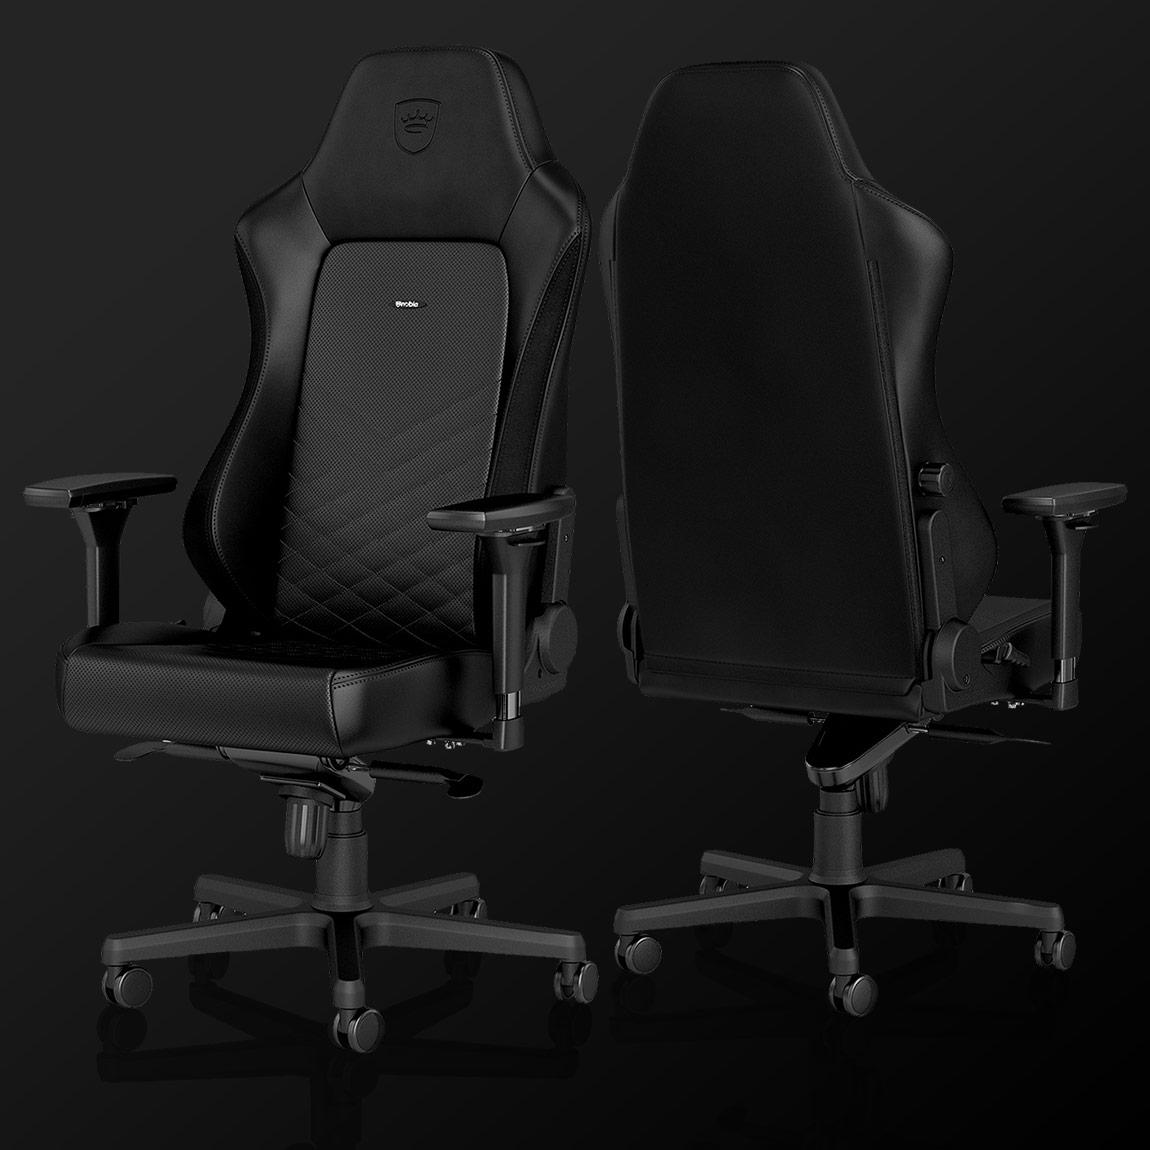 HERO Gaming Chair